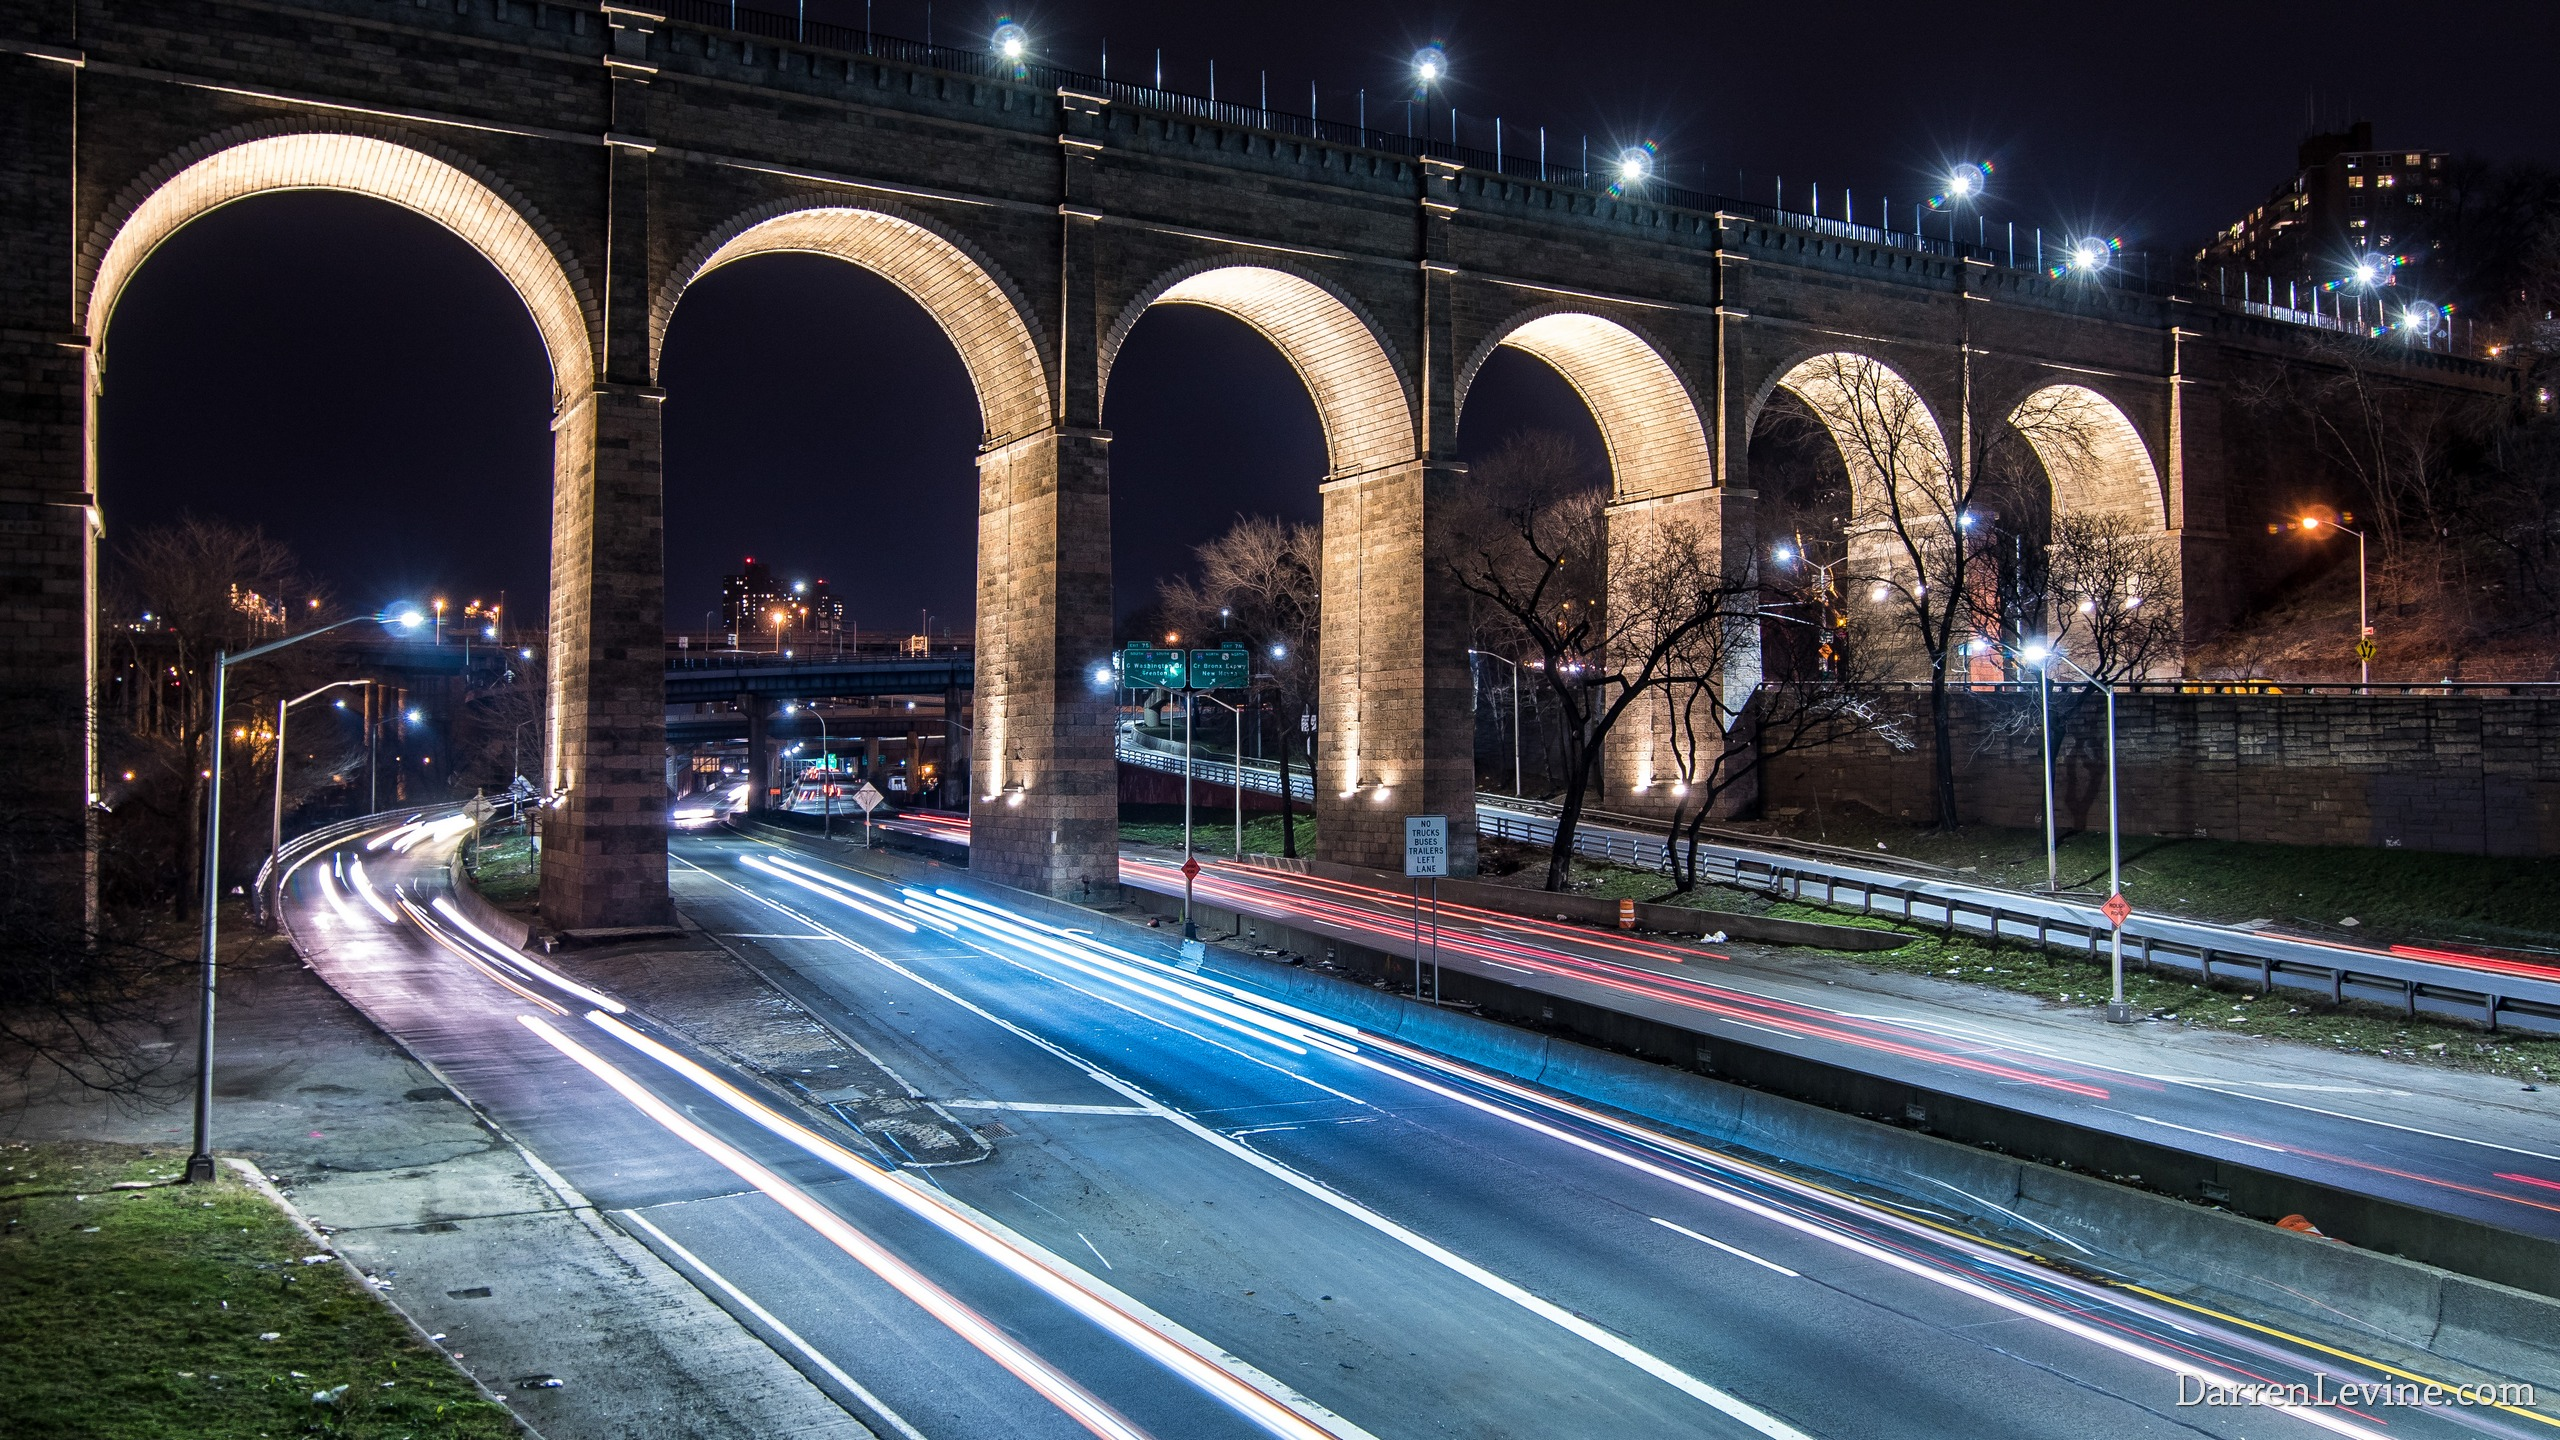 Beautiful Night Photograph Of The City S Oldest Bridge The Bronx Manhattan High Bridge